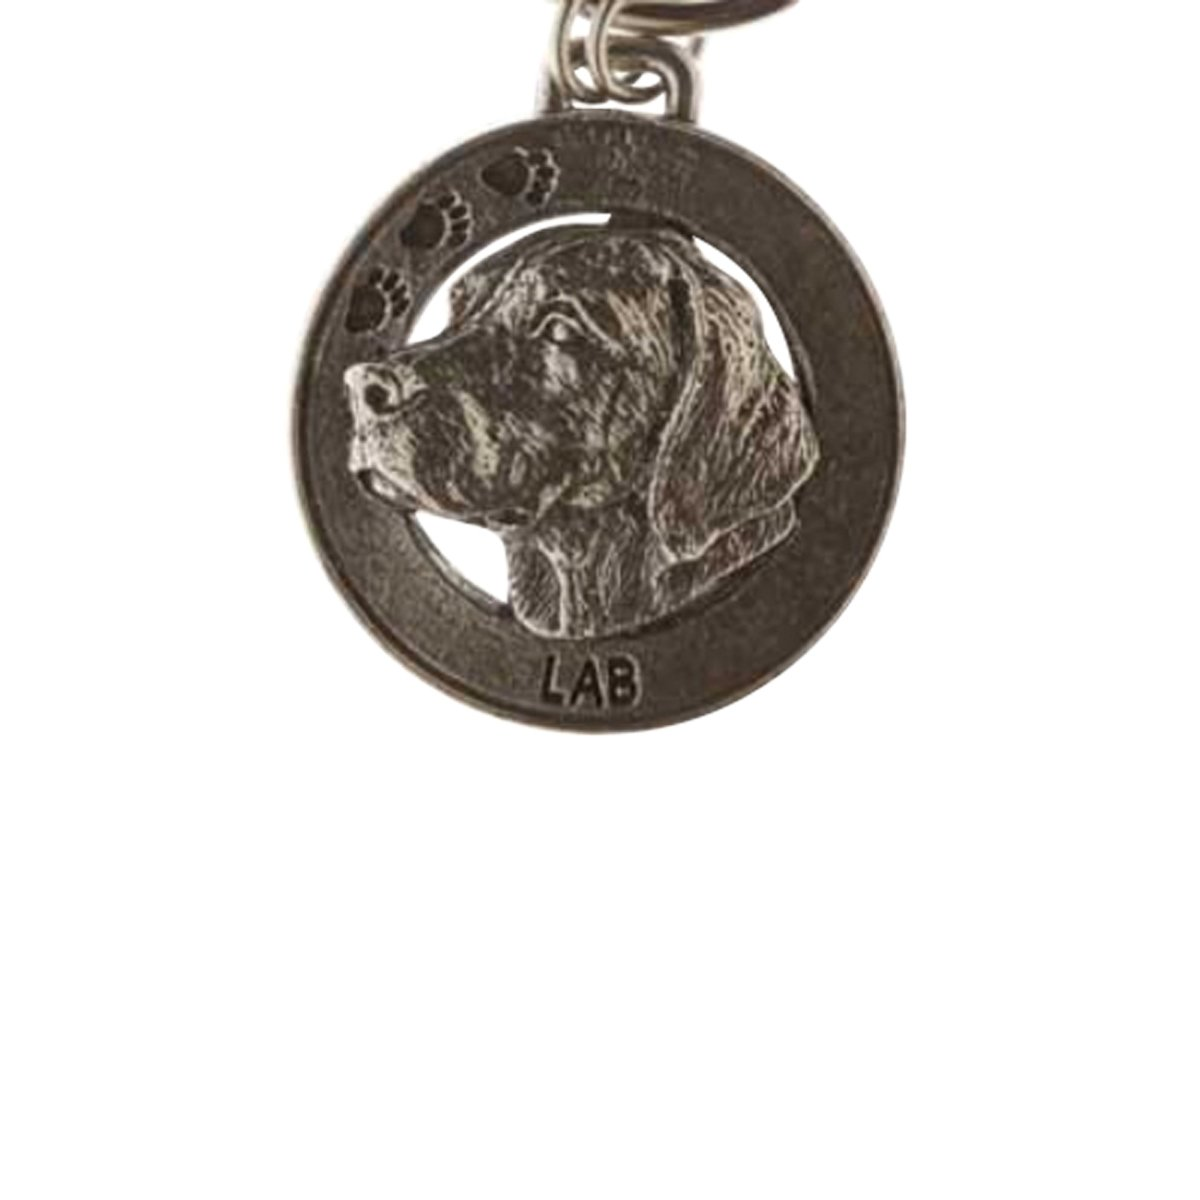 Creative Pewter Designs, Pewter Labrador Key Chain, Antiqued Finish, DK112